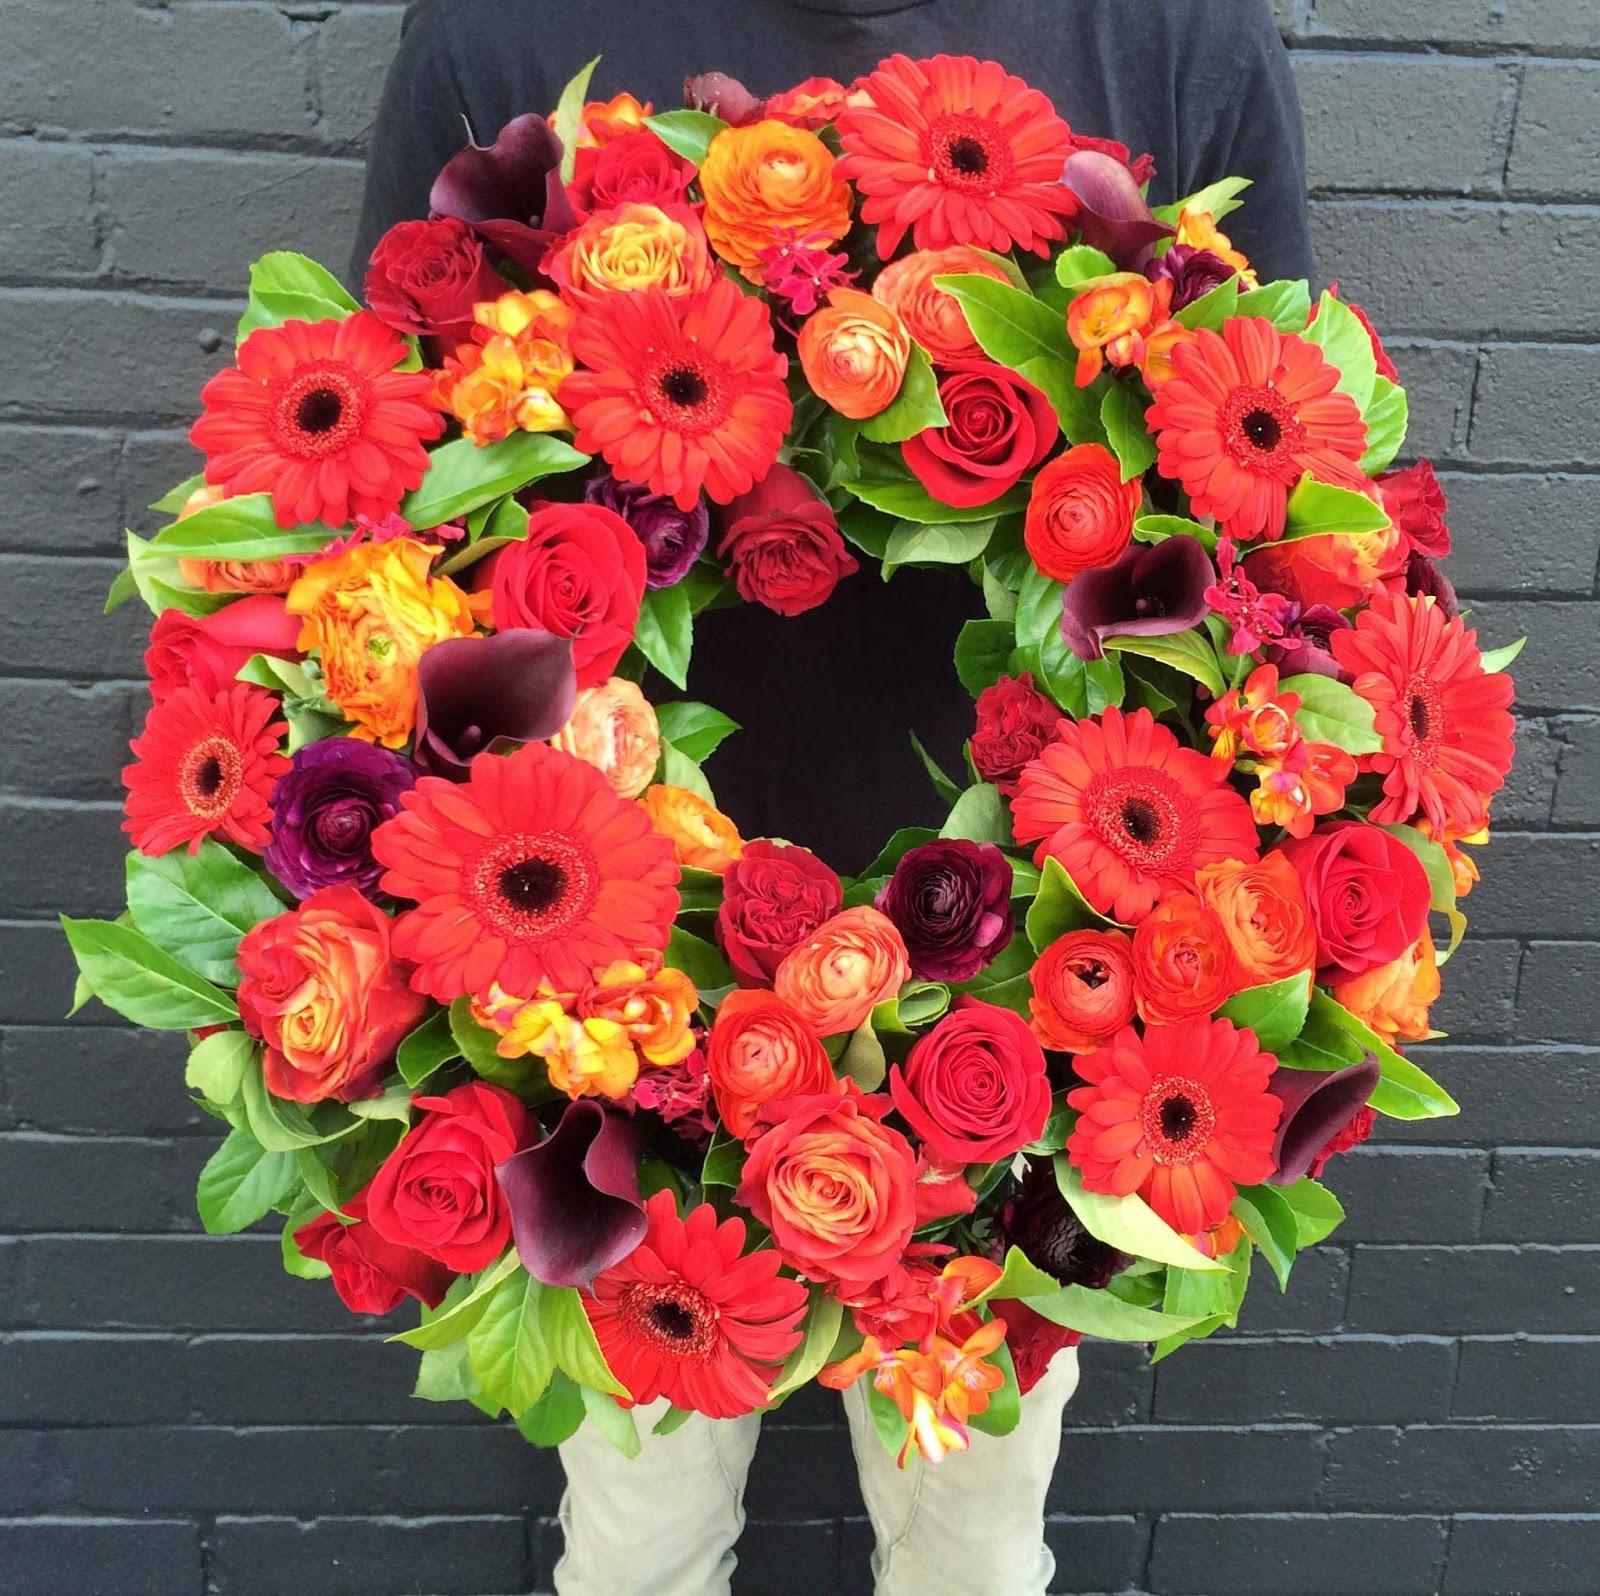 Urban Flower Three Beautiful Funeral Wreaths